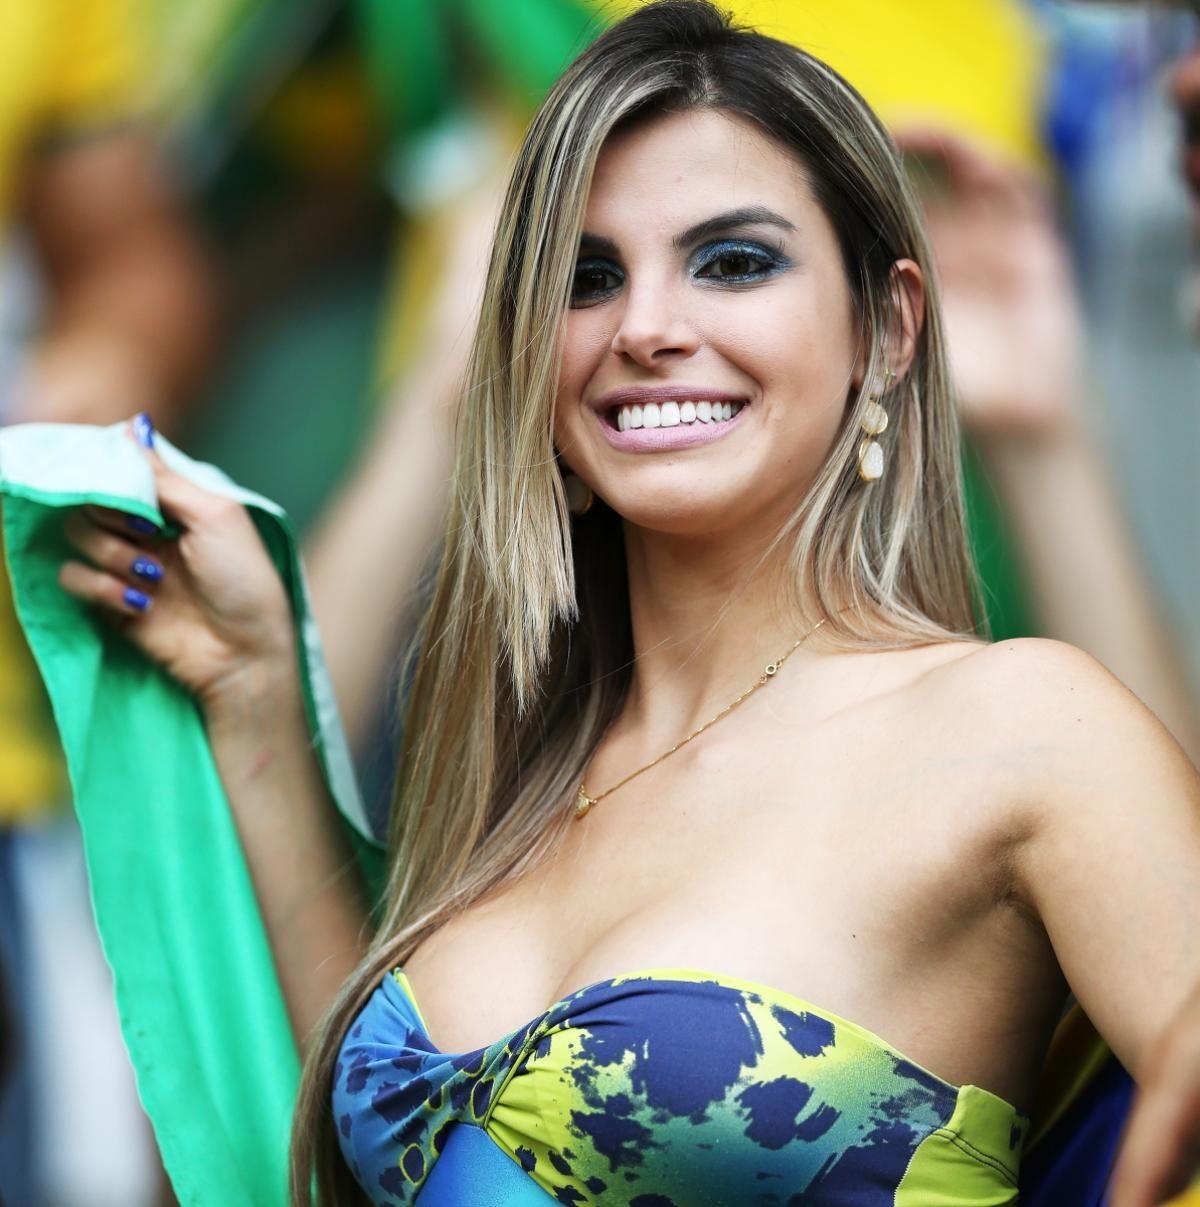 Perhaps Toppless brazilian women photos